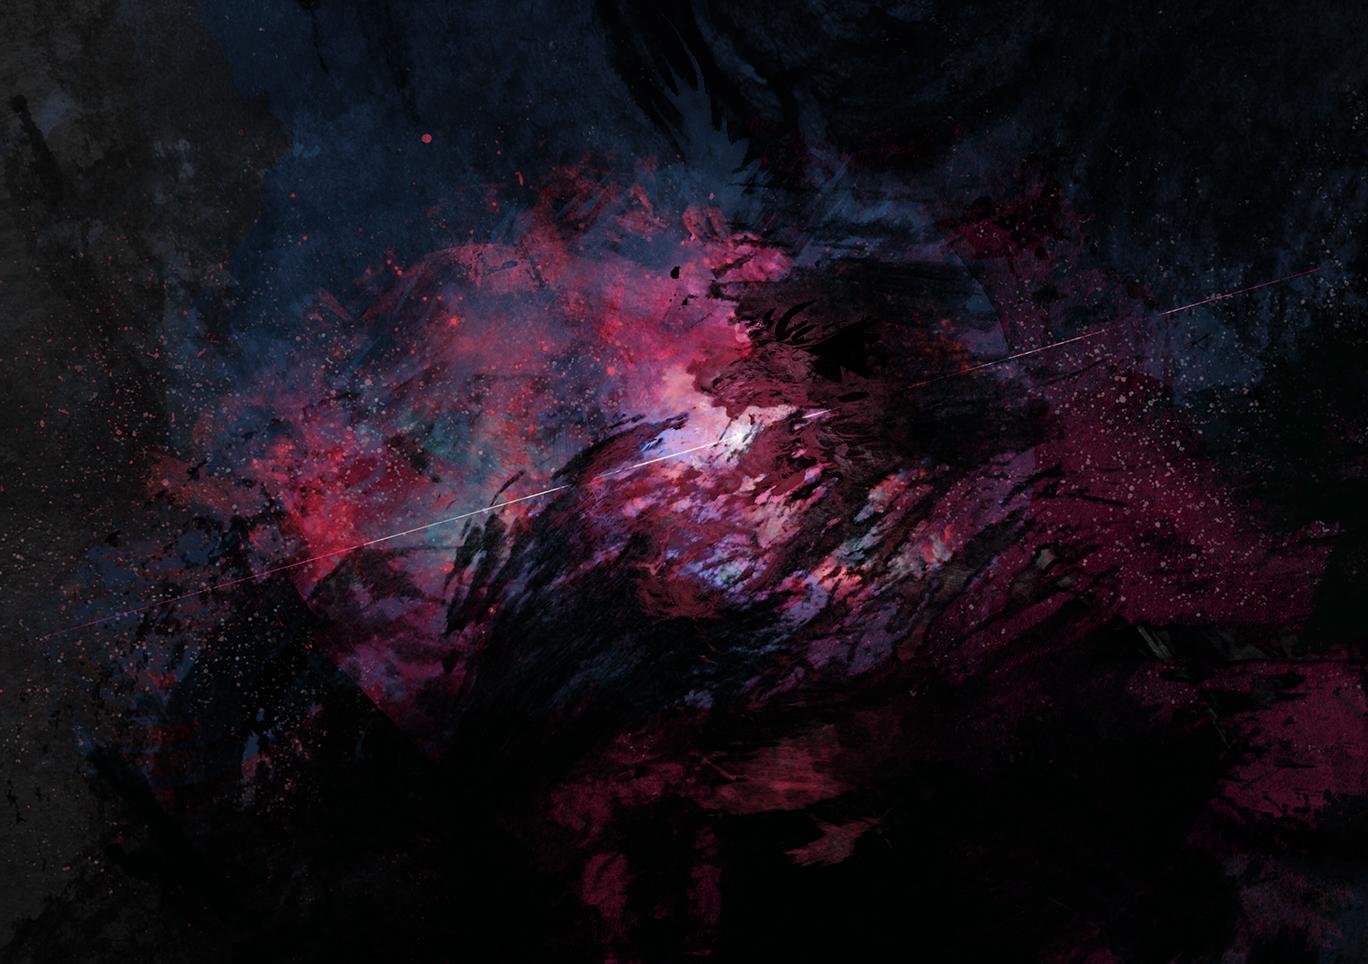 Deep Black Wallpaper - Alfreedo free graphics download